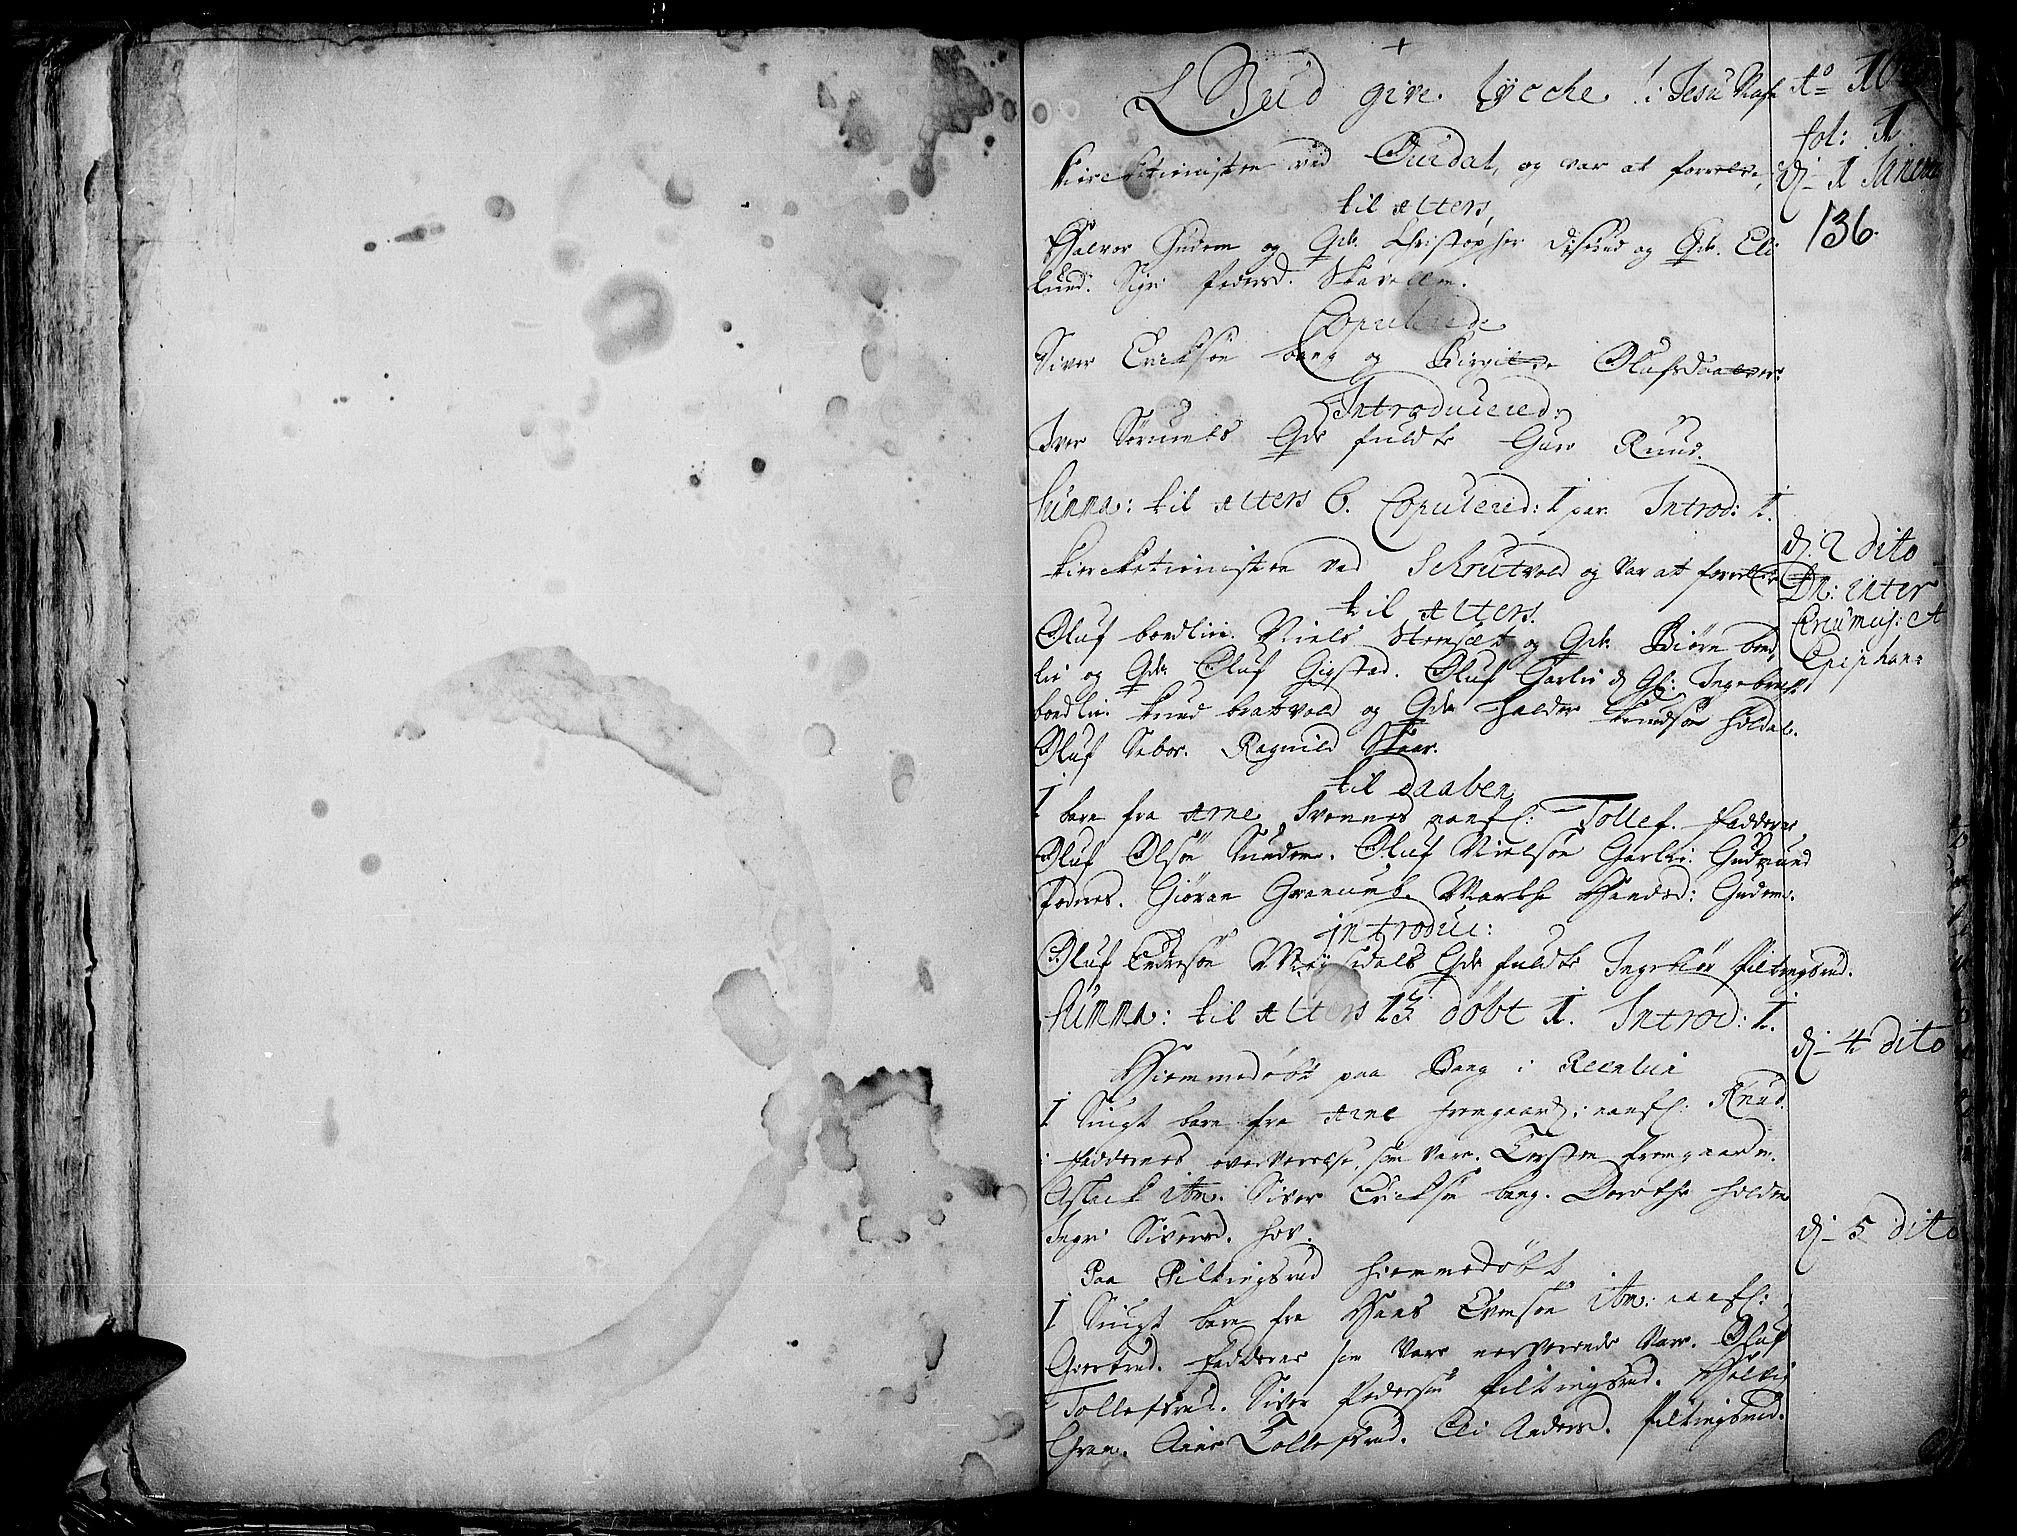 SAH, Aurdal prestekontor, Ministerialbok nr. 1-3, 1692-1730, s. 136